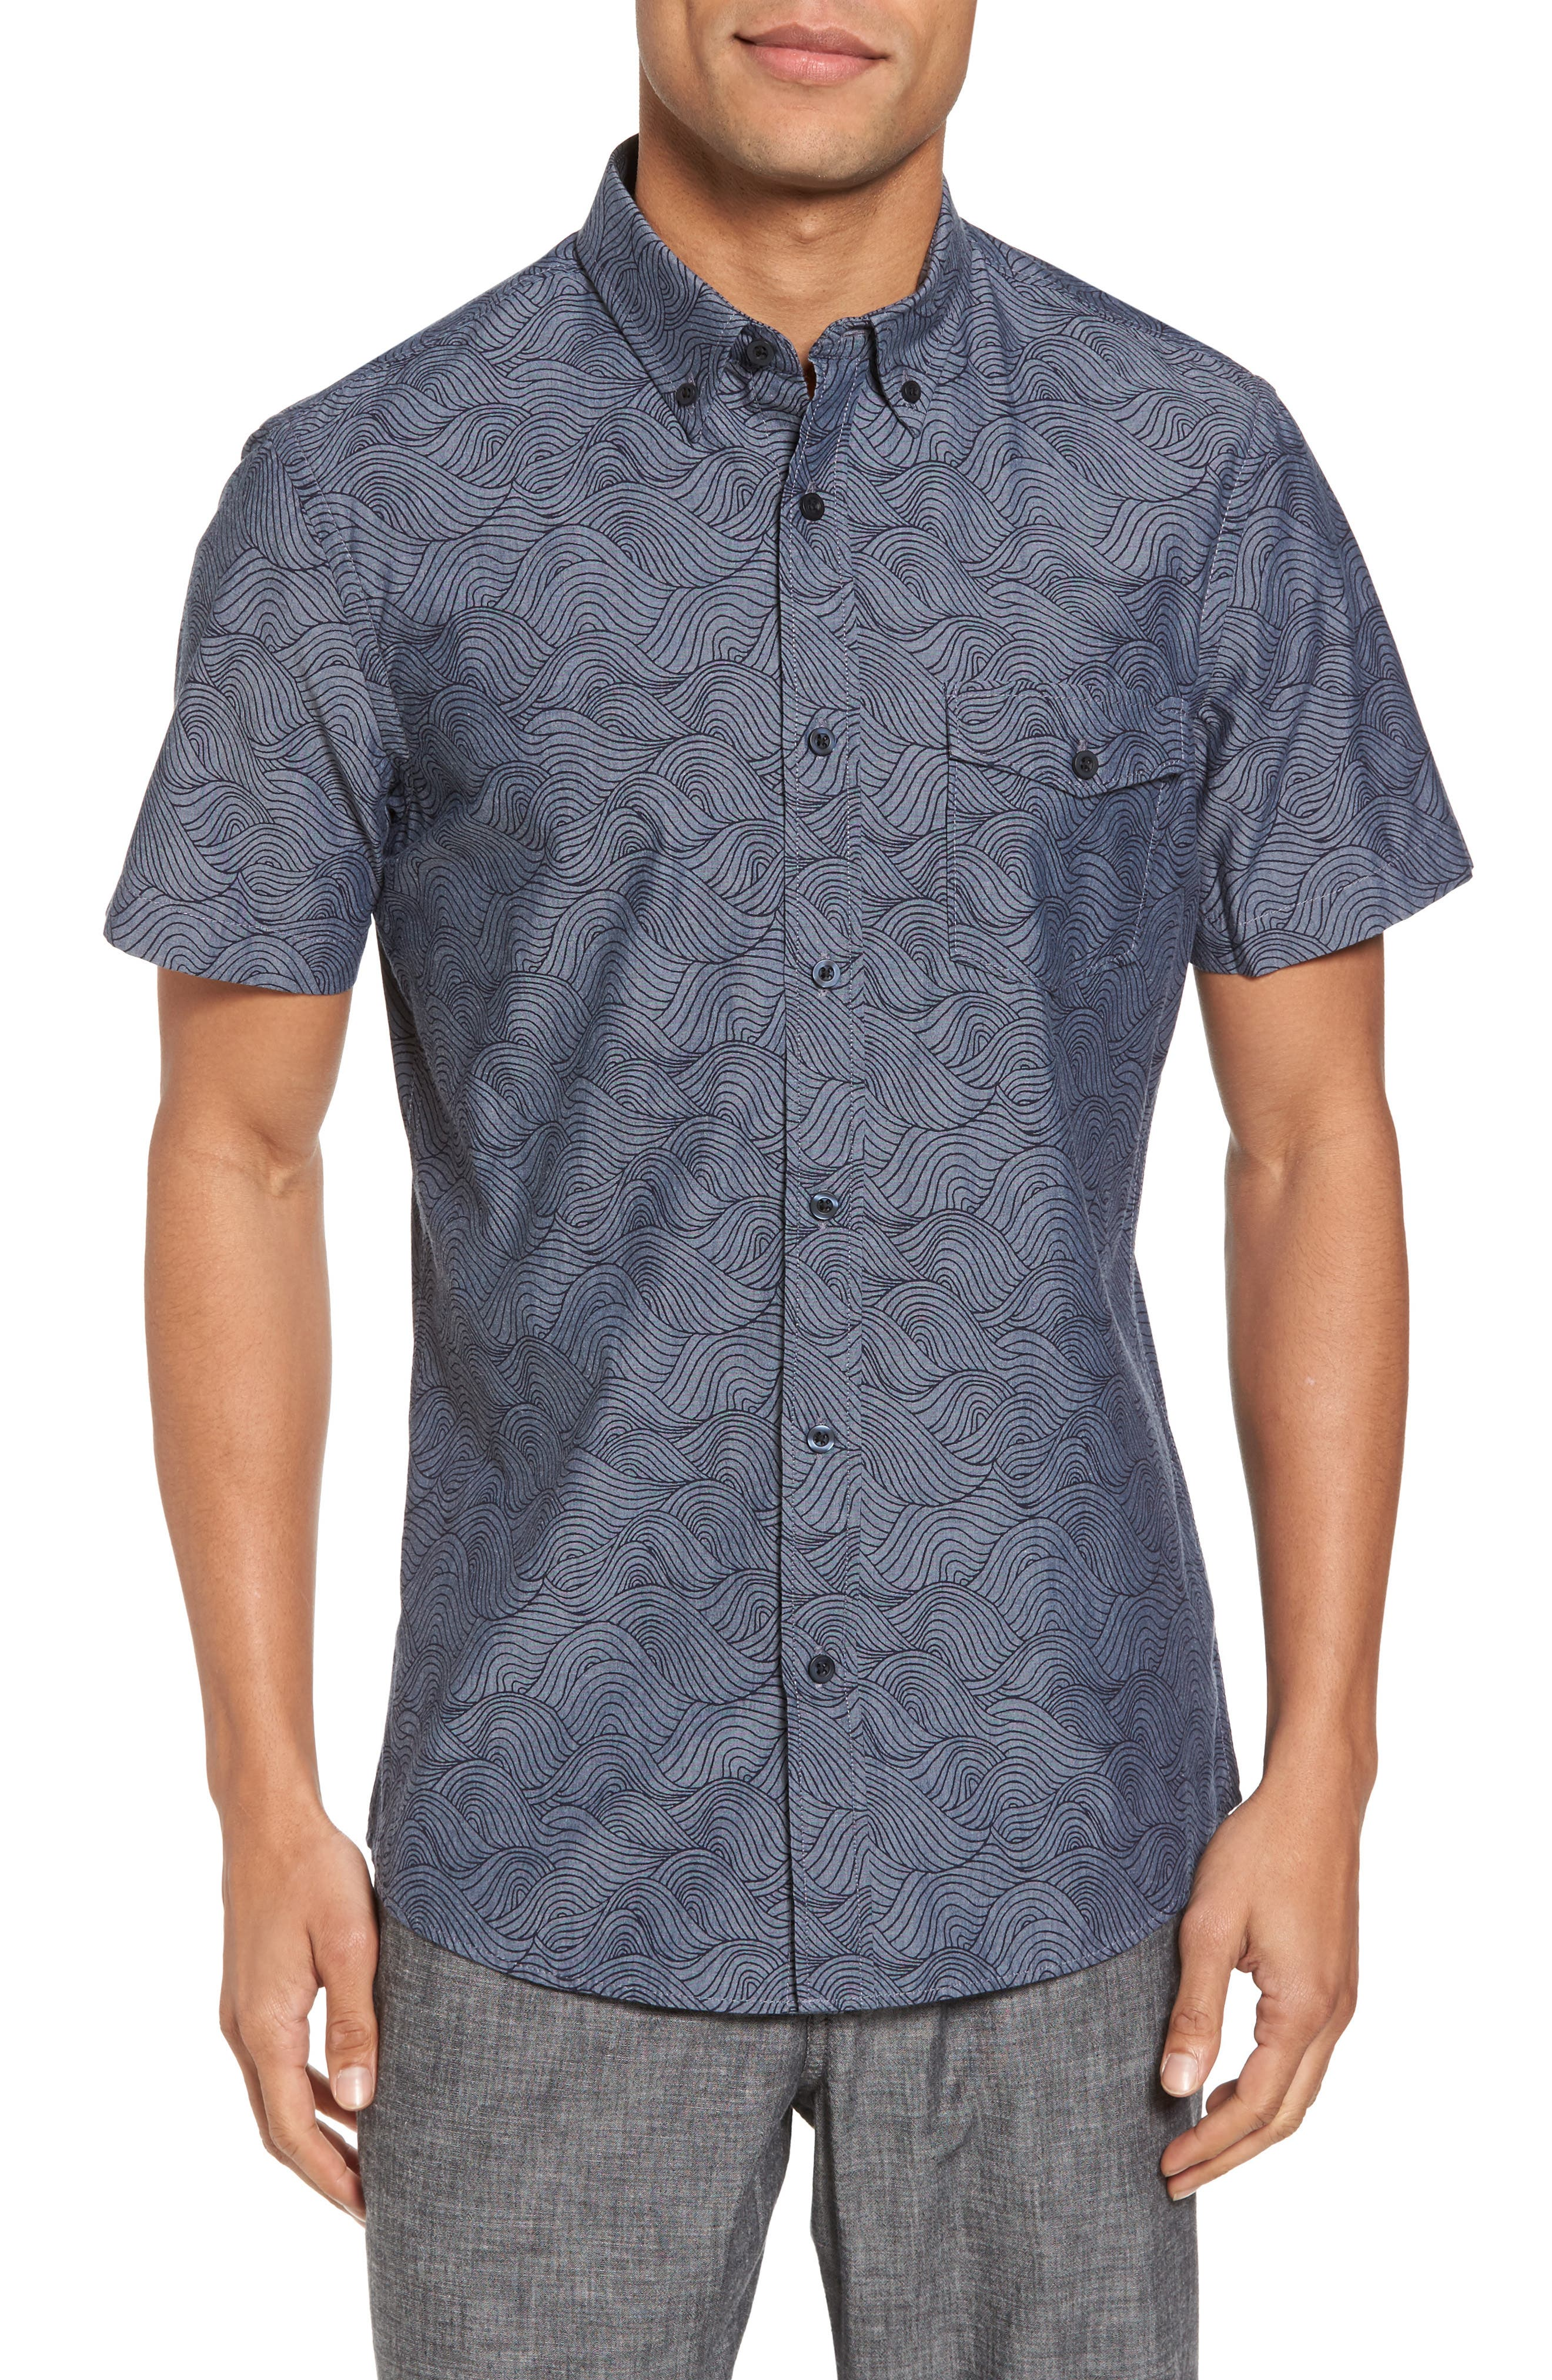 Trim Fit Ivy Print Sport Shirt,                         Main,                         color, Grey Onyx Rolling Waves